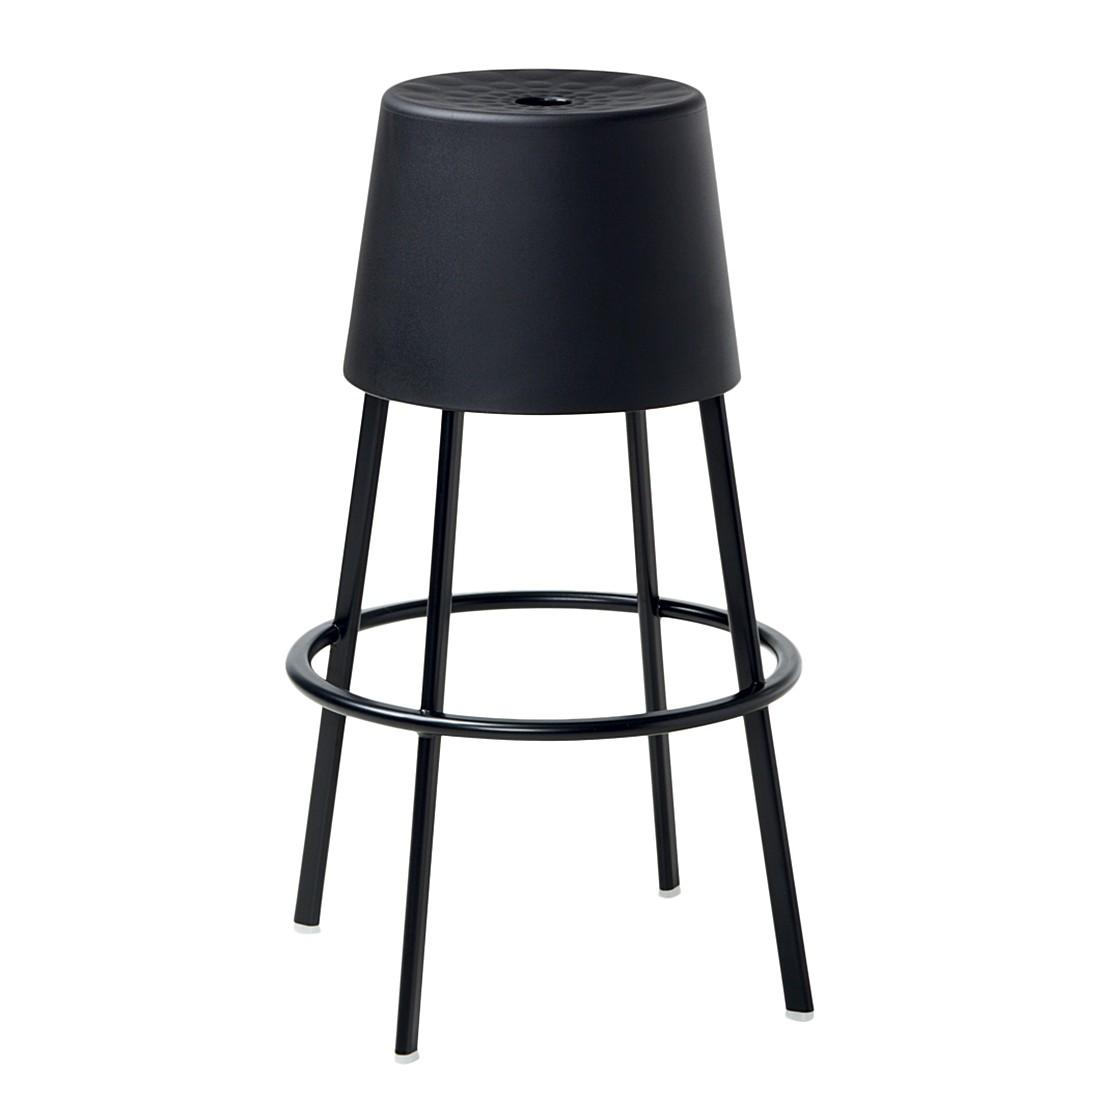 hocker marrakech kunststoff metall schwarz schwarz sitzh he 77 cm casamania g nstig kaufen. Black Bedroom Furniture Sets. Home Design Ideas